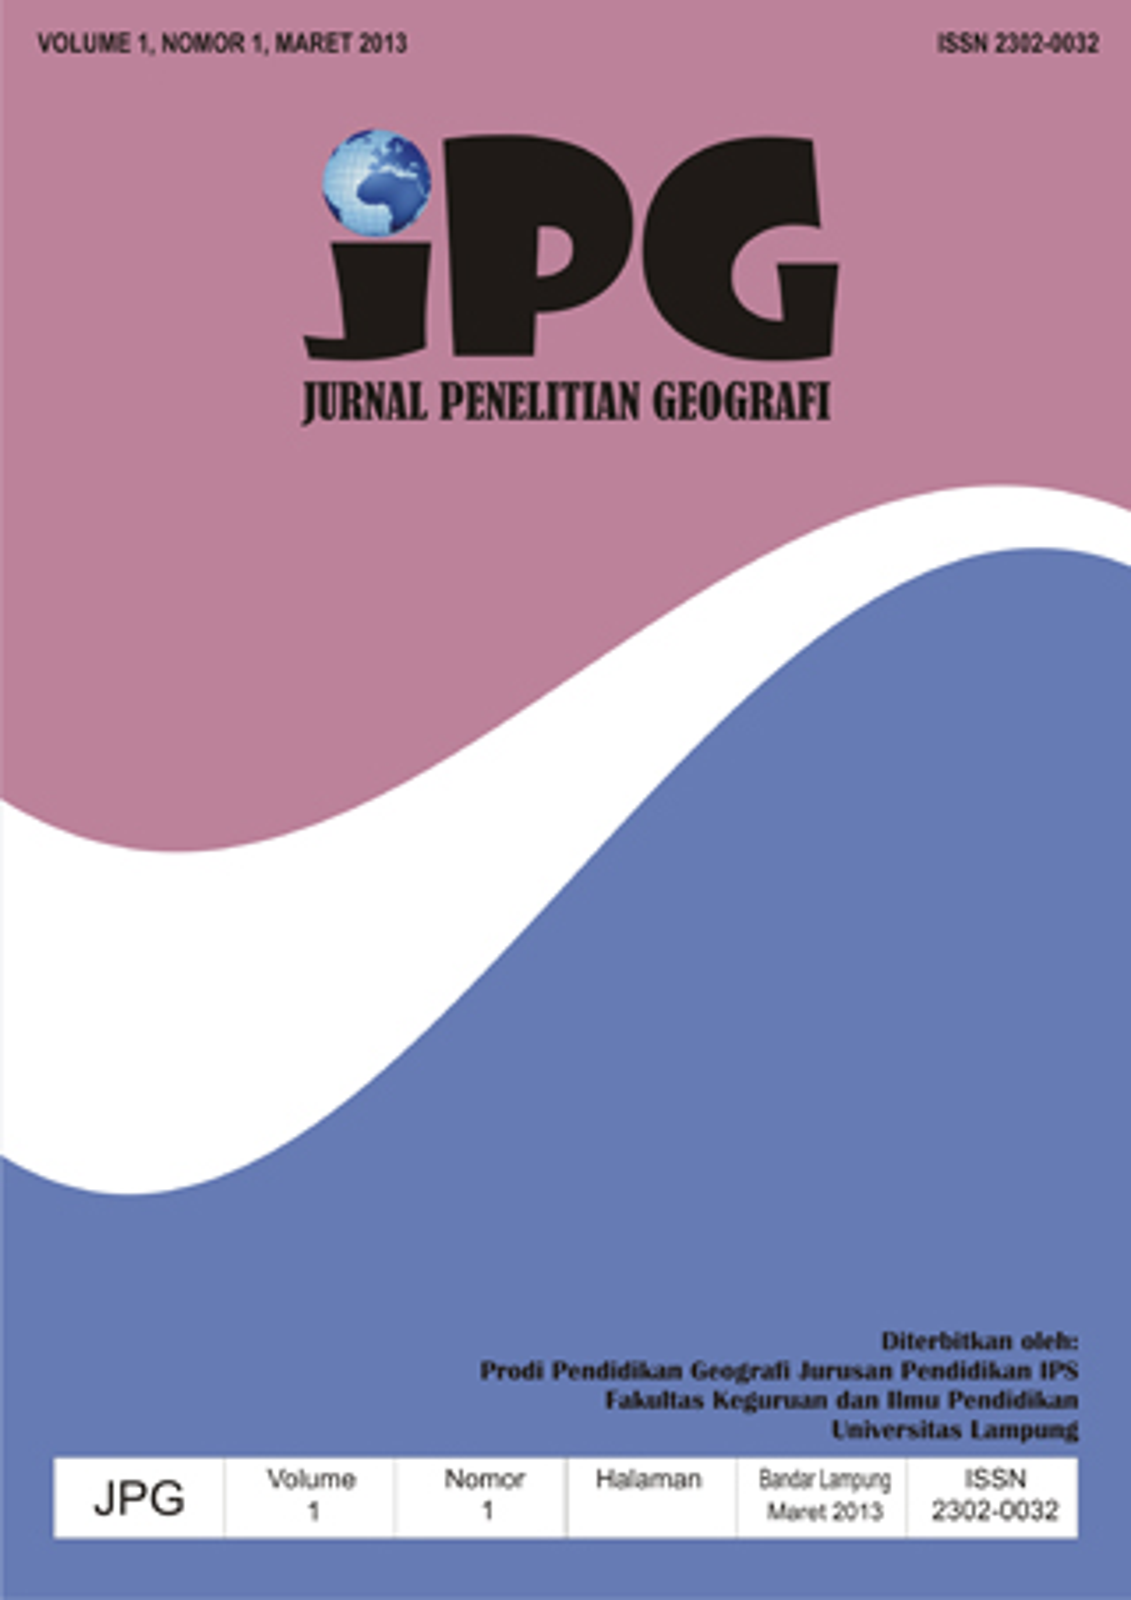 Jpg Jurnal Penelitian Geografi